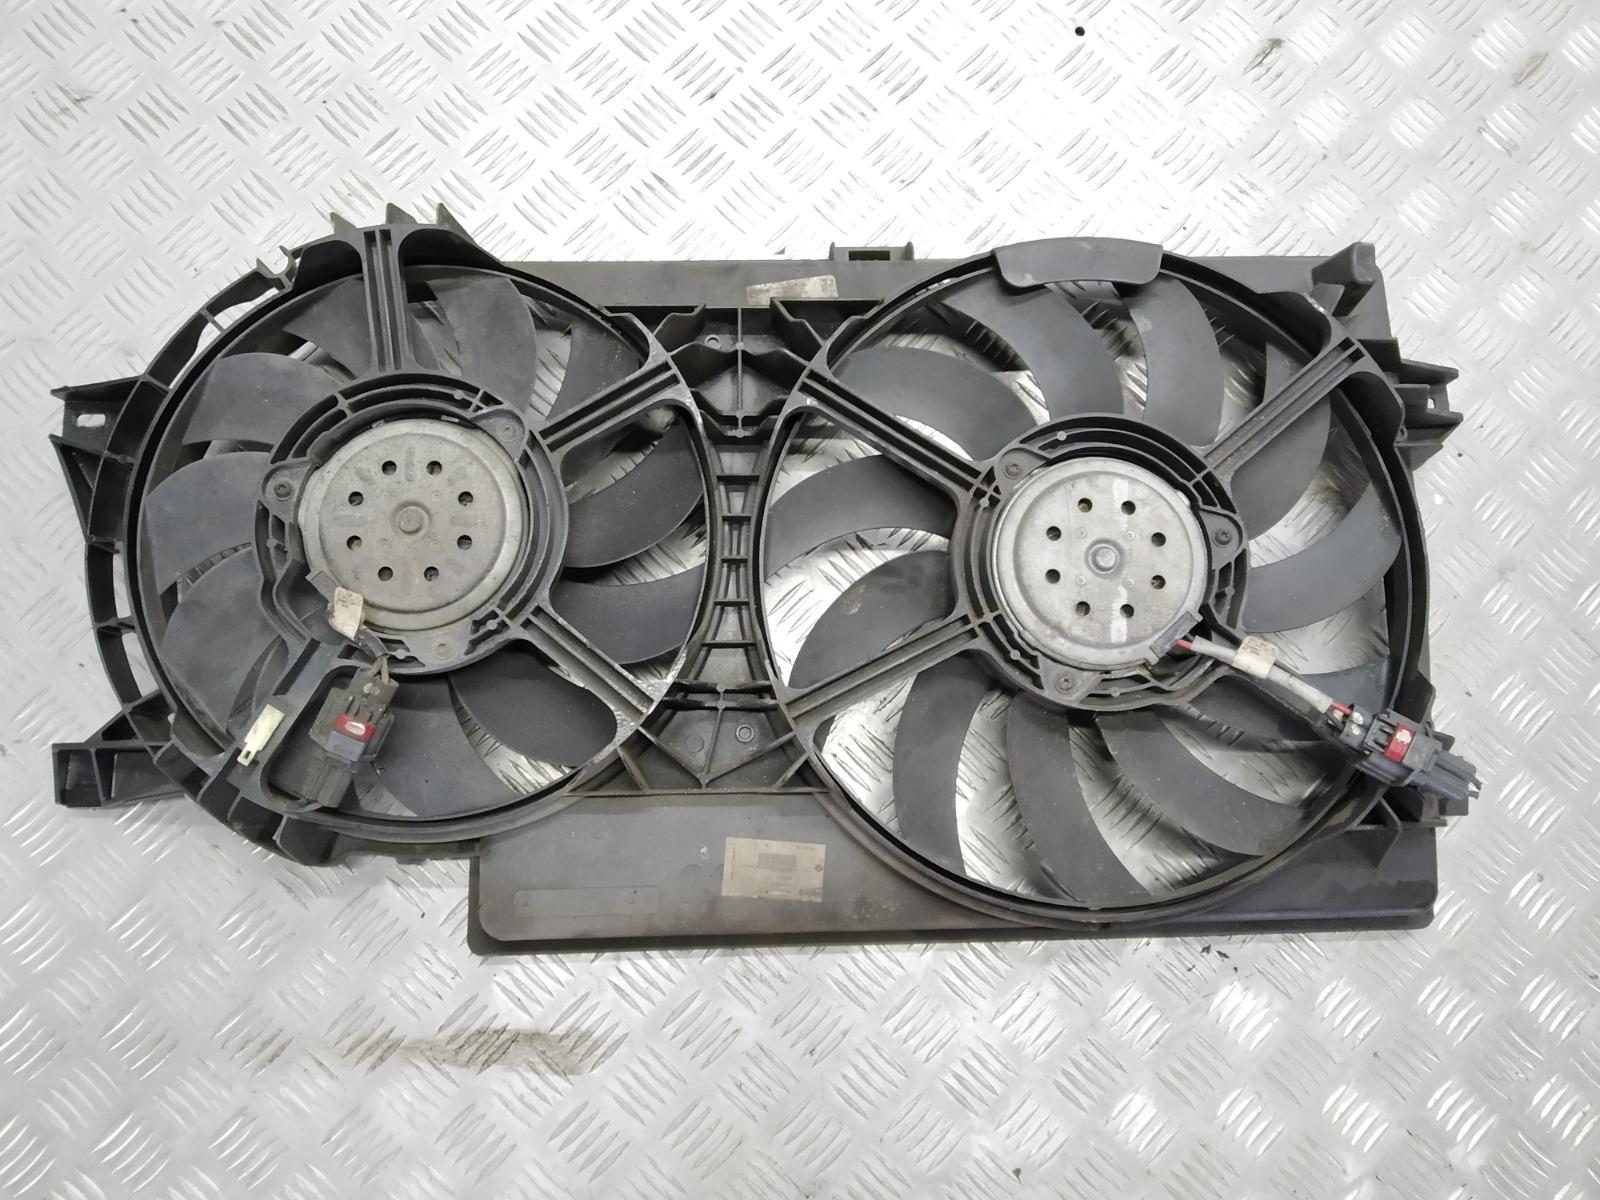 Вентилятор радиатора Chrysler Voyager 2.8 CRDI 2006 (б/у)